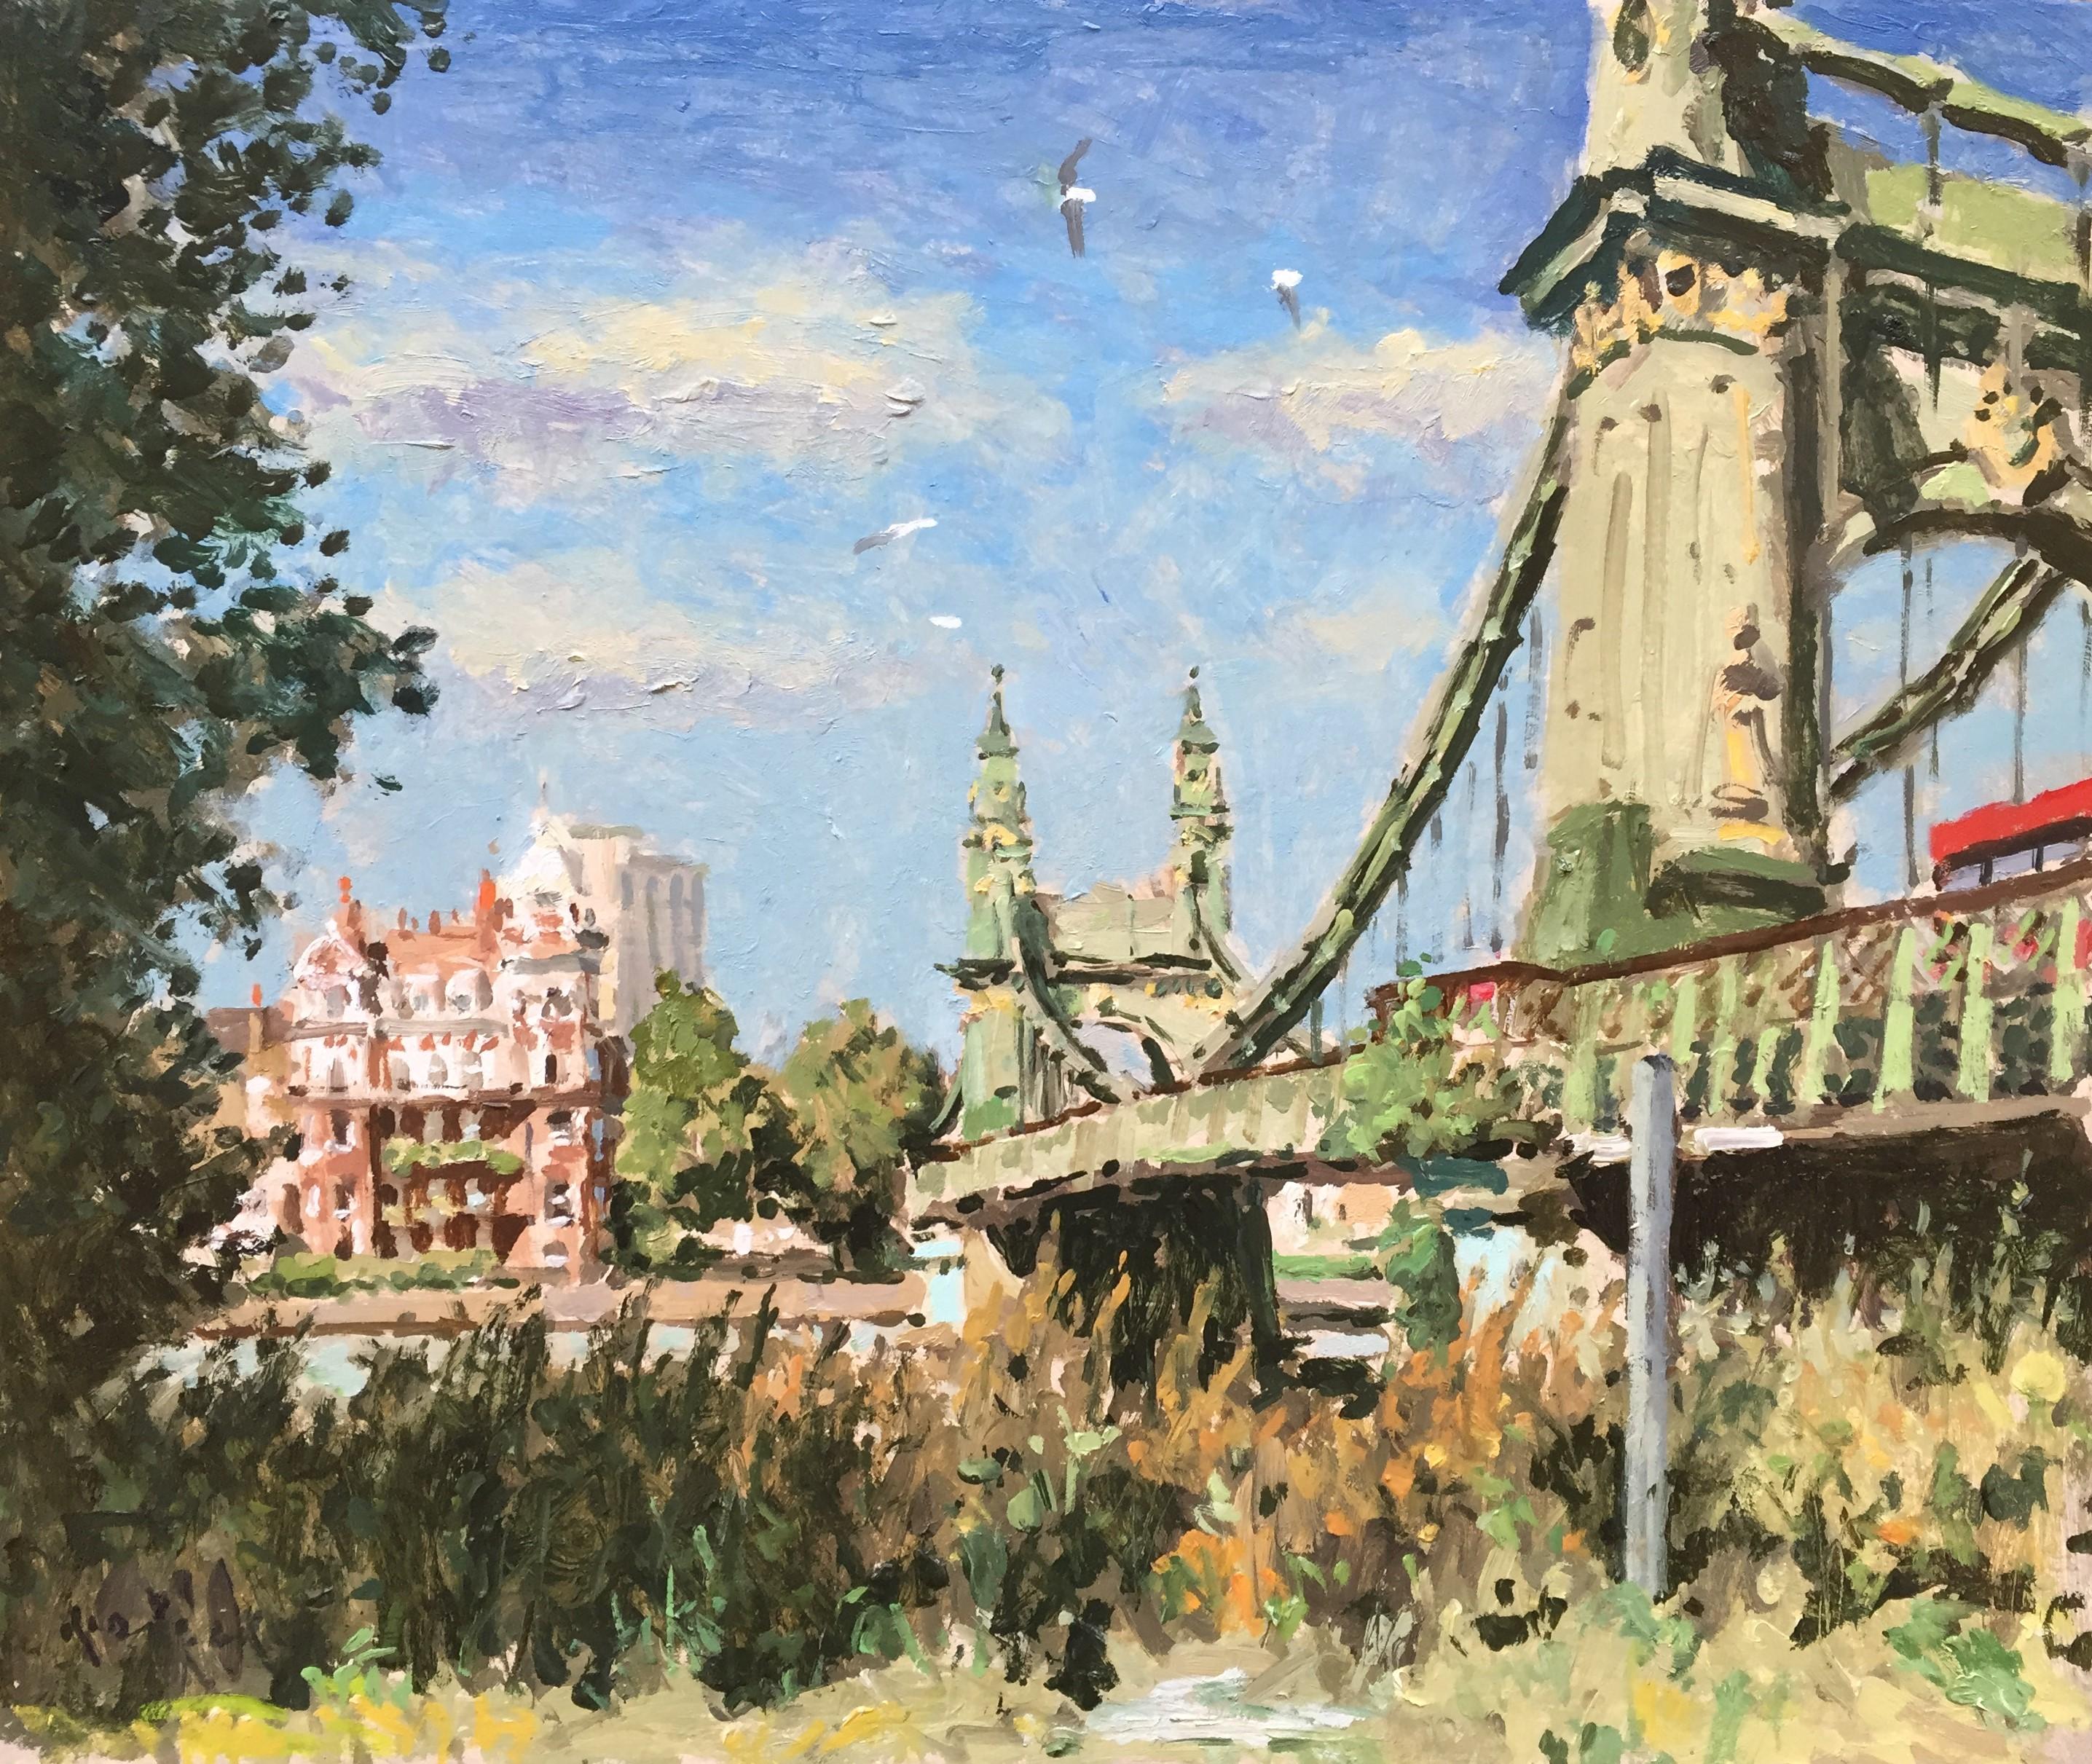 Hammersmith Bridge 2 by Rod Pearce